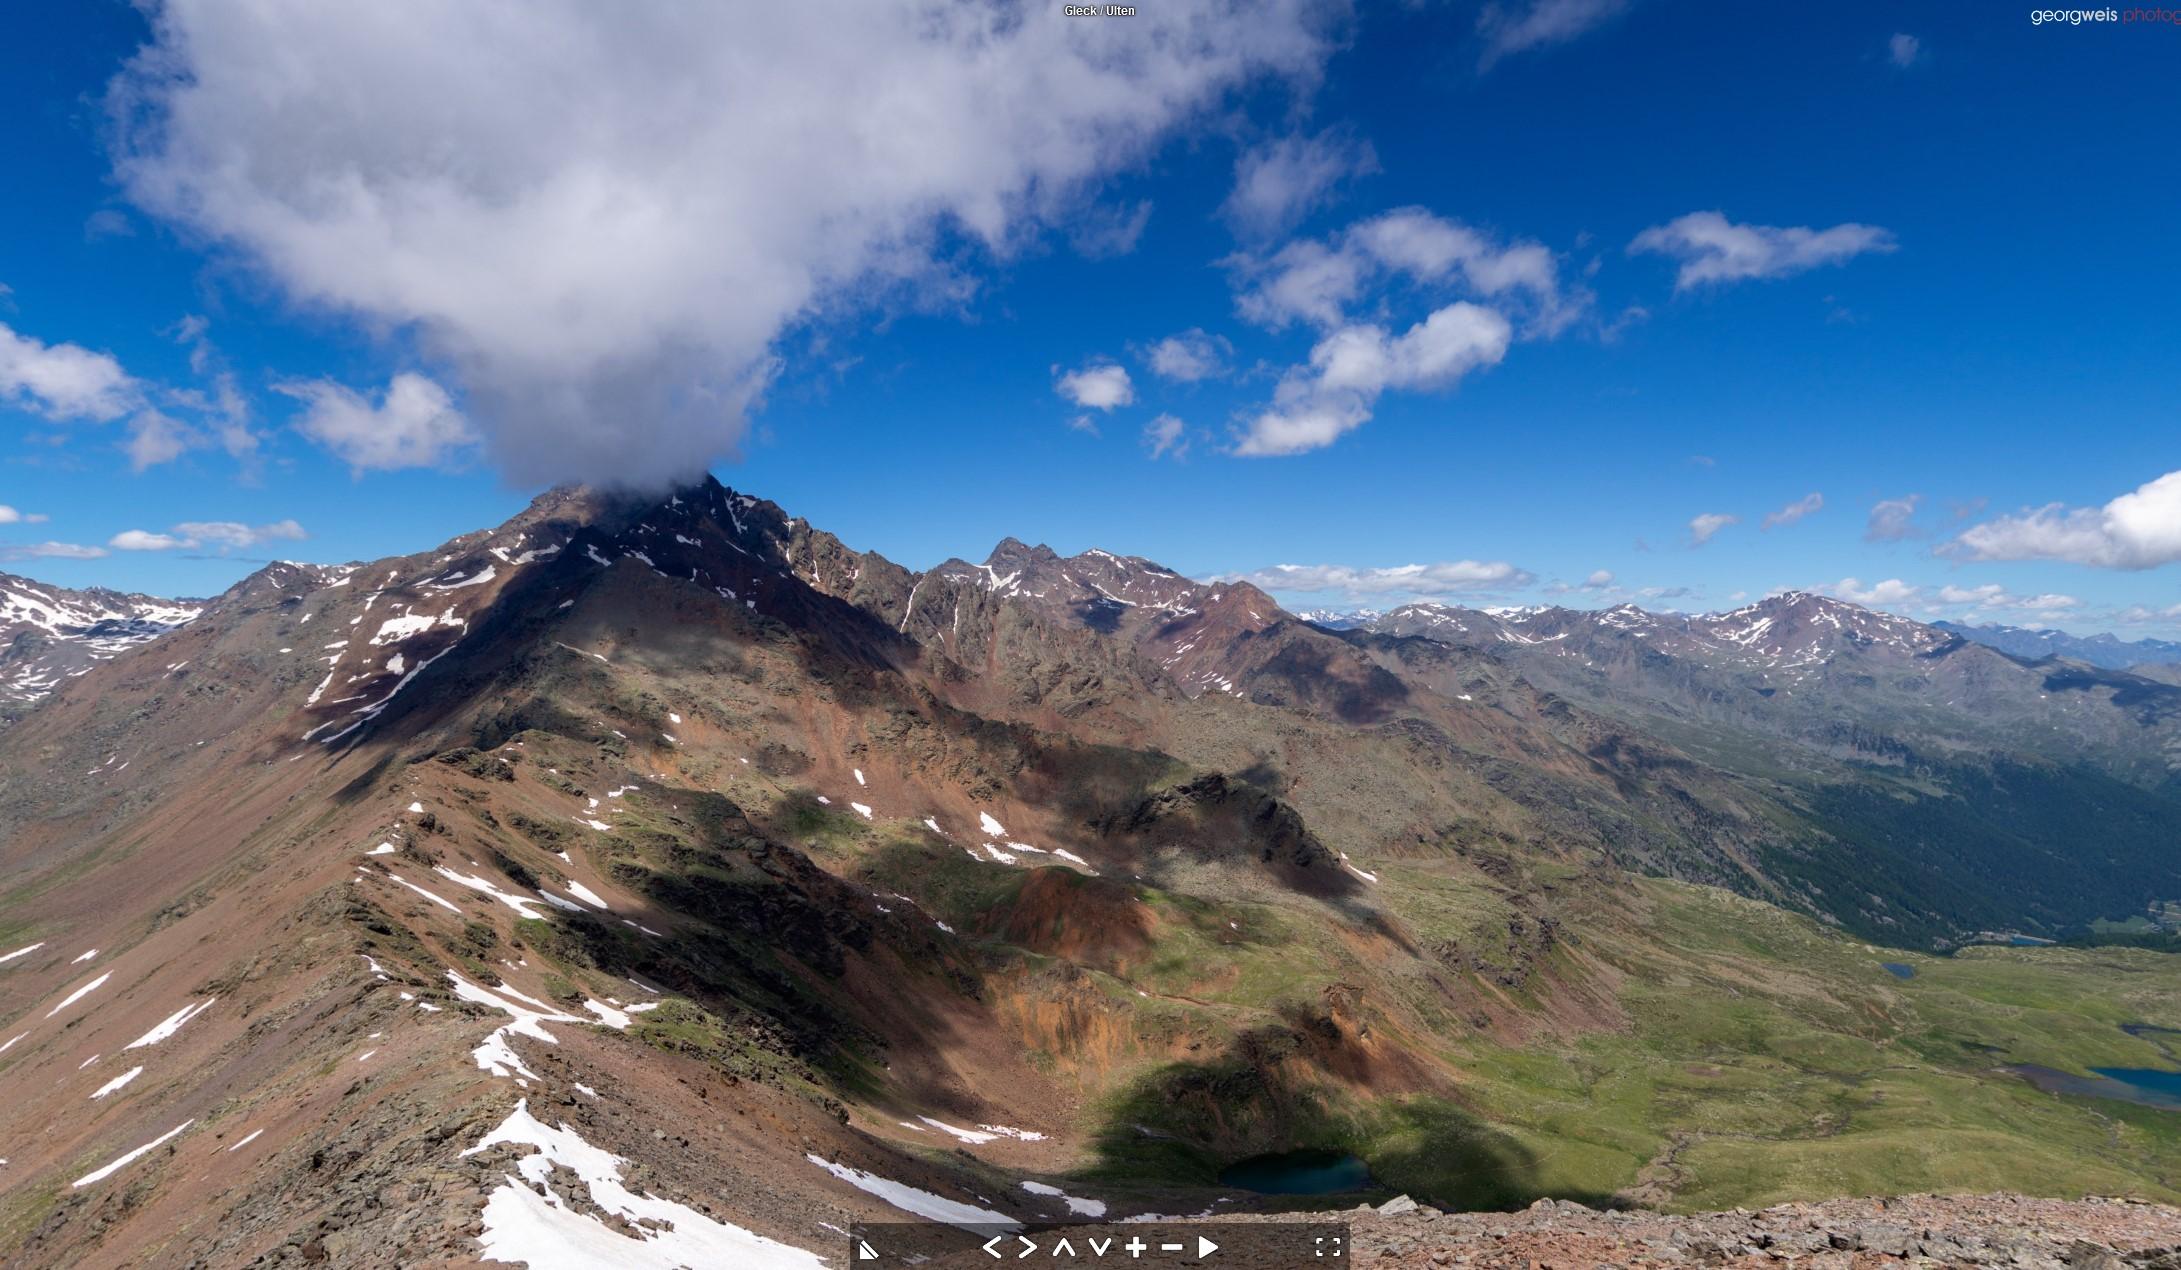 Gleck (2957 m), Ulten